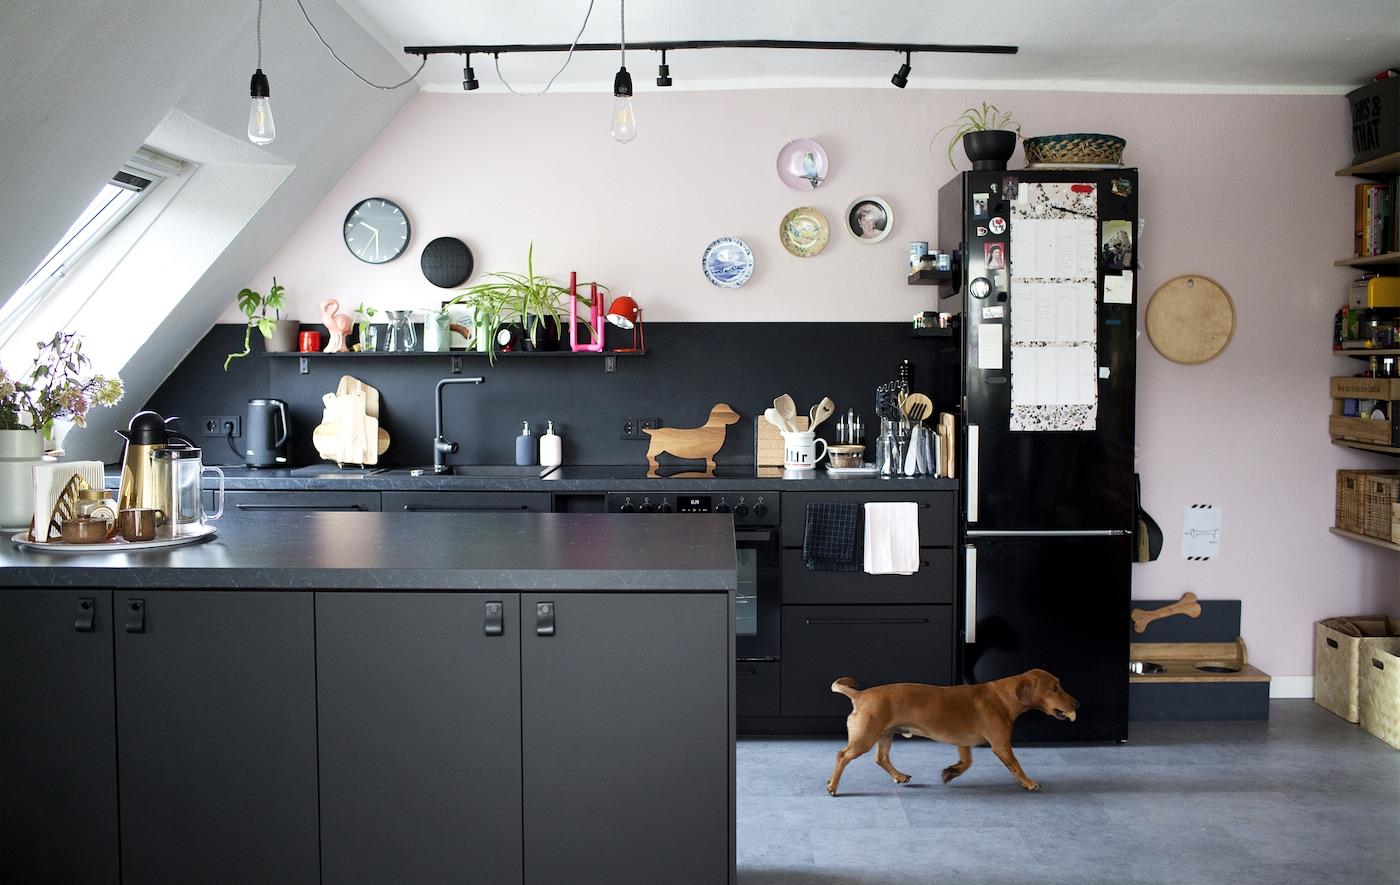 Cucina Bianca E Nera Ikea un attico minimalista sulle colline bavaresi - ikea it